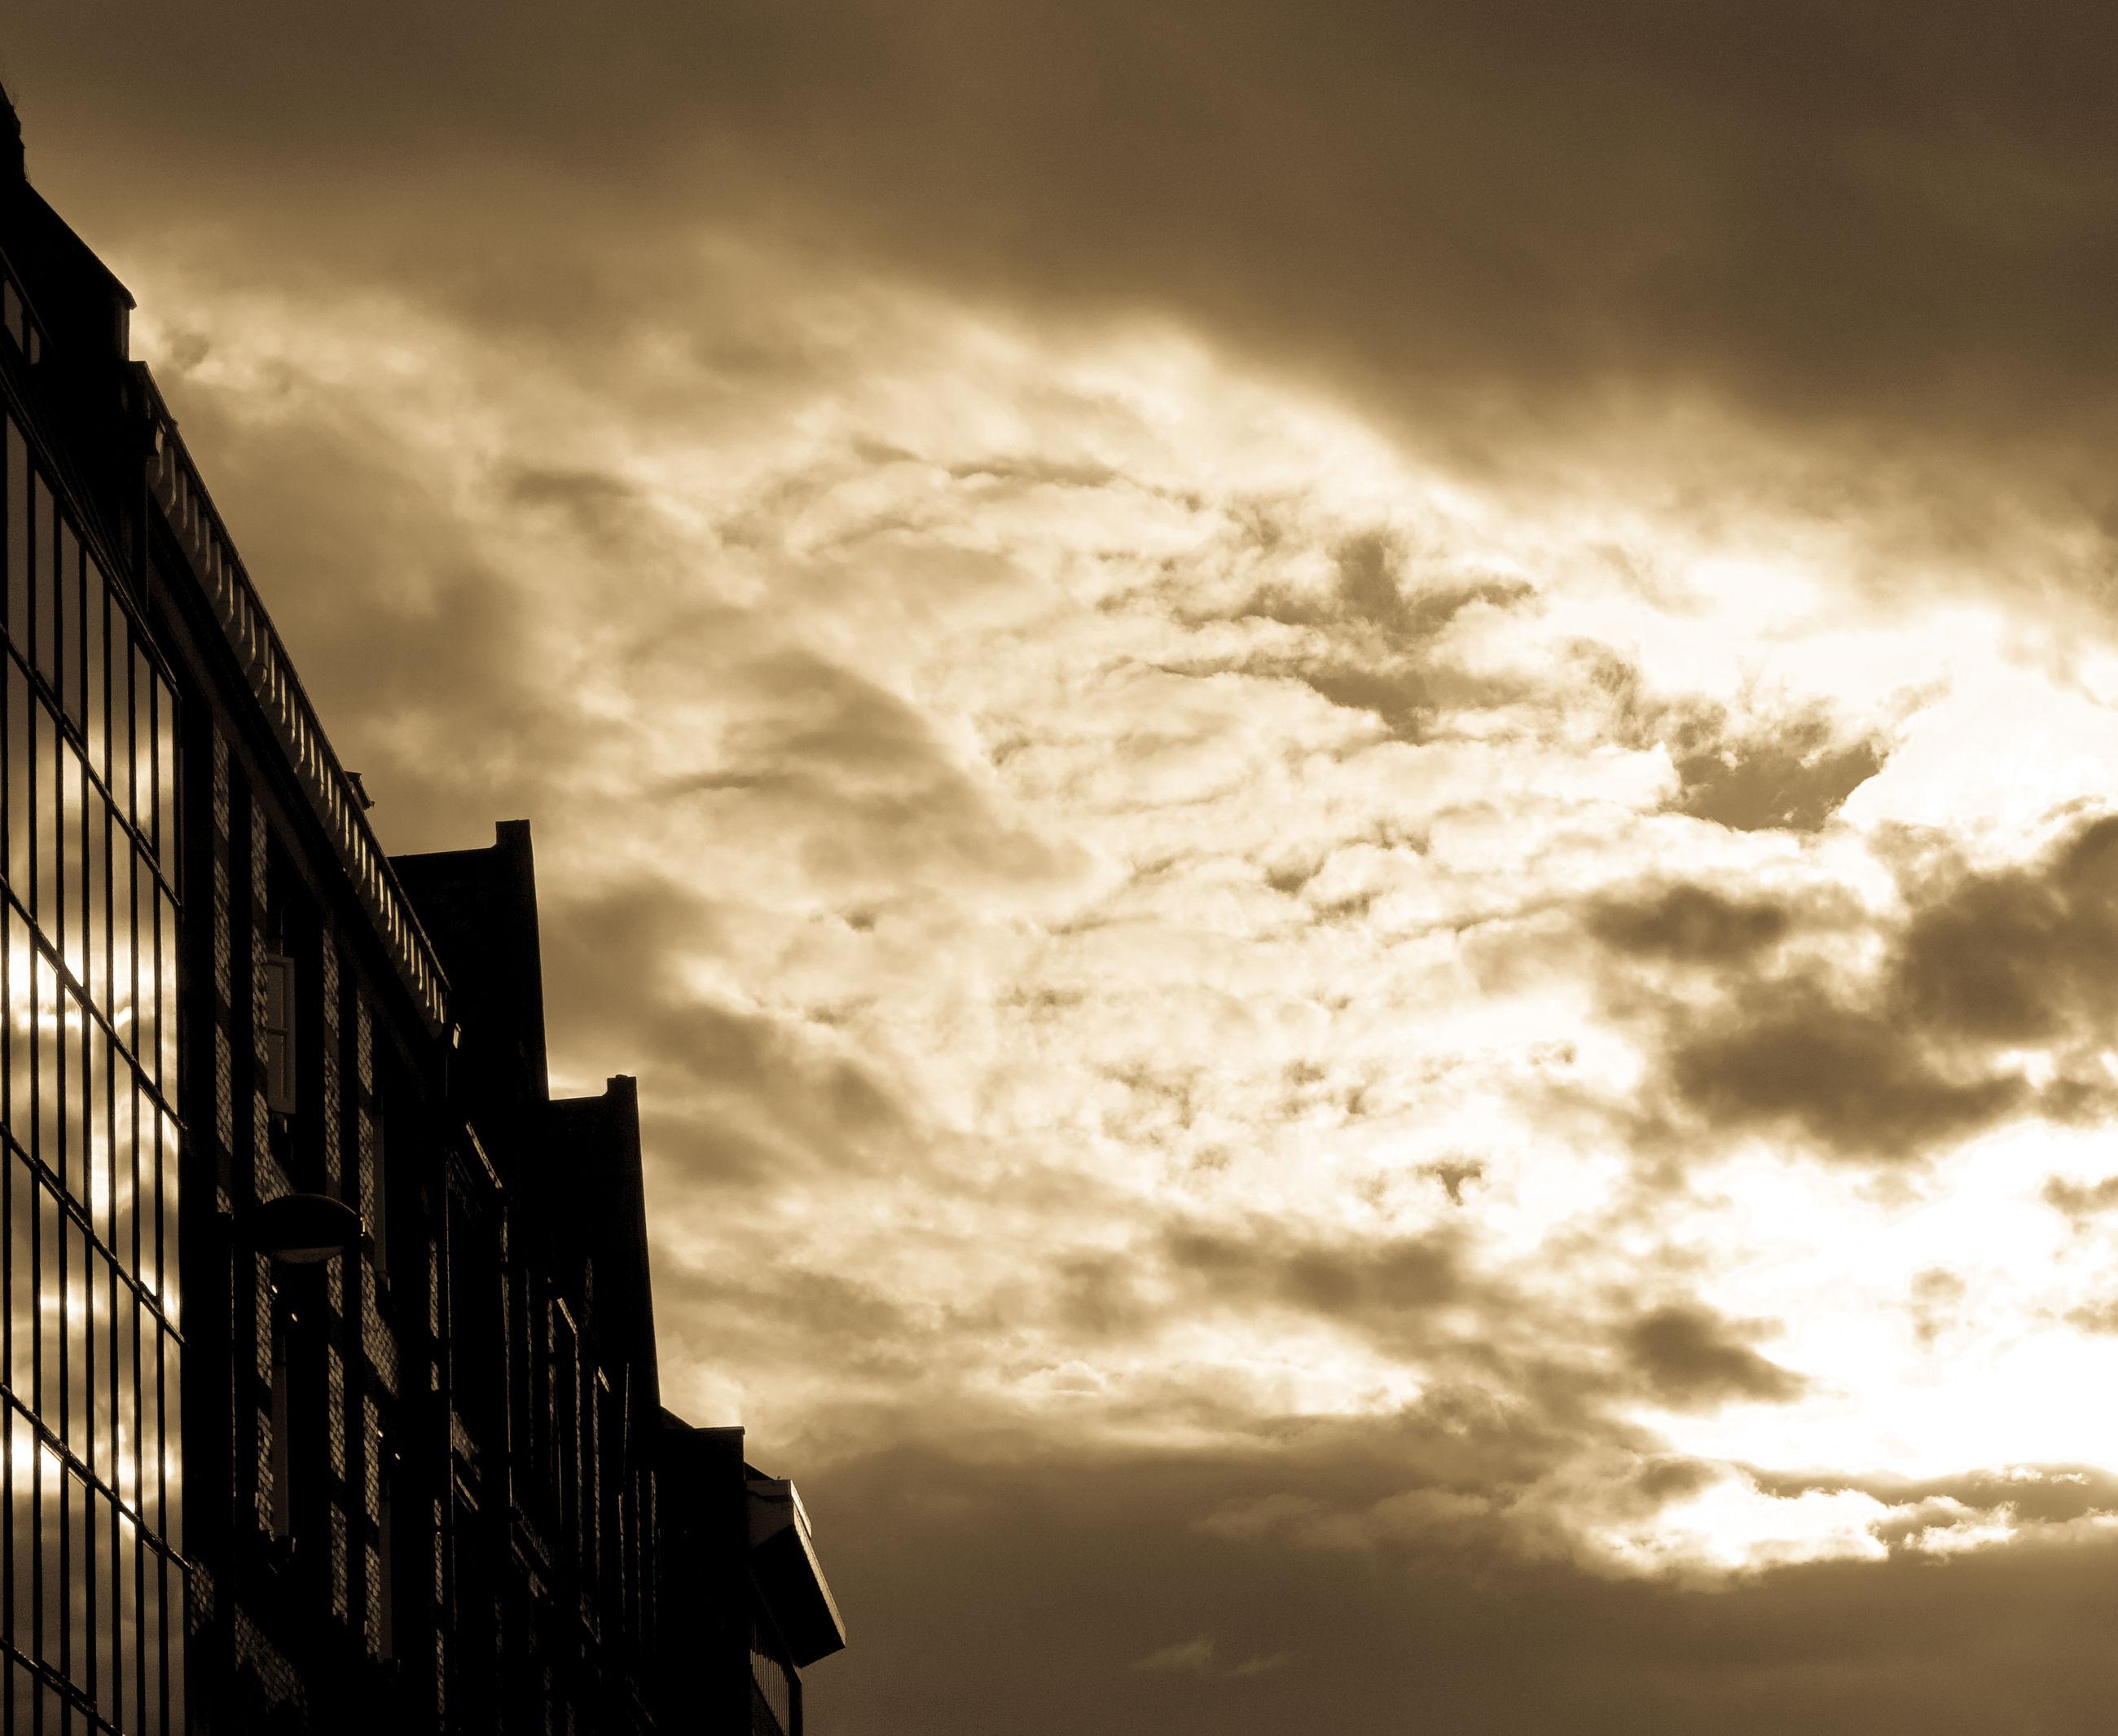 sky, architecture, building exterior, cloud - sky, built structure, cloudy, low angle view, cloud, sunset, building, weather, overcast, city, residential structure, residential building, outdoors, dramatic sky, no people, dusk, storm cloud